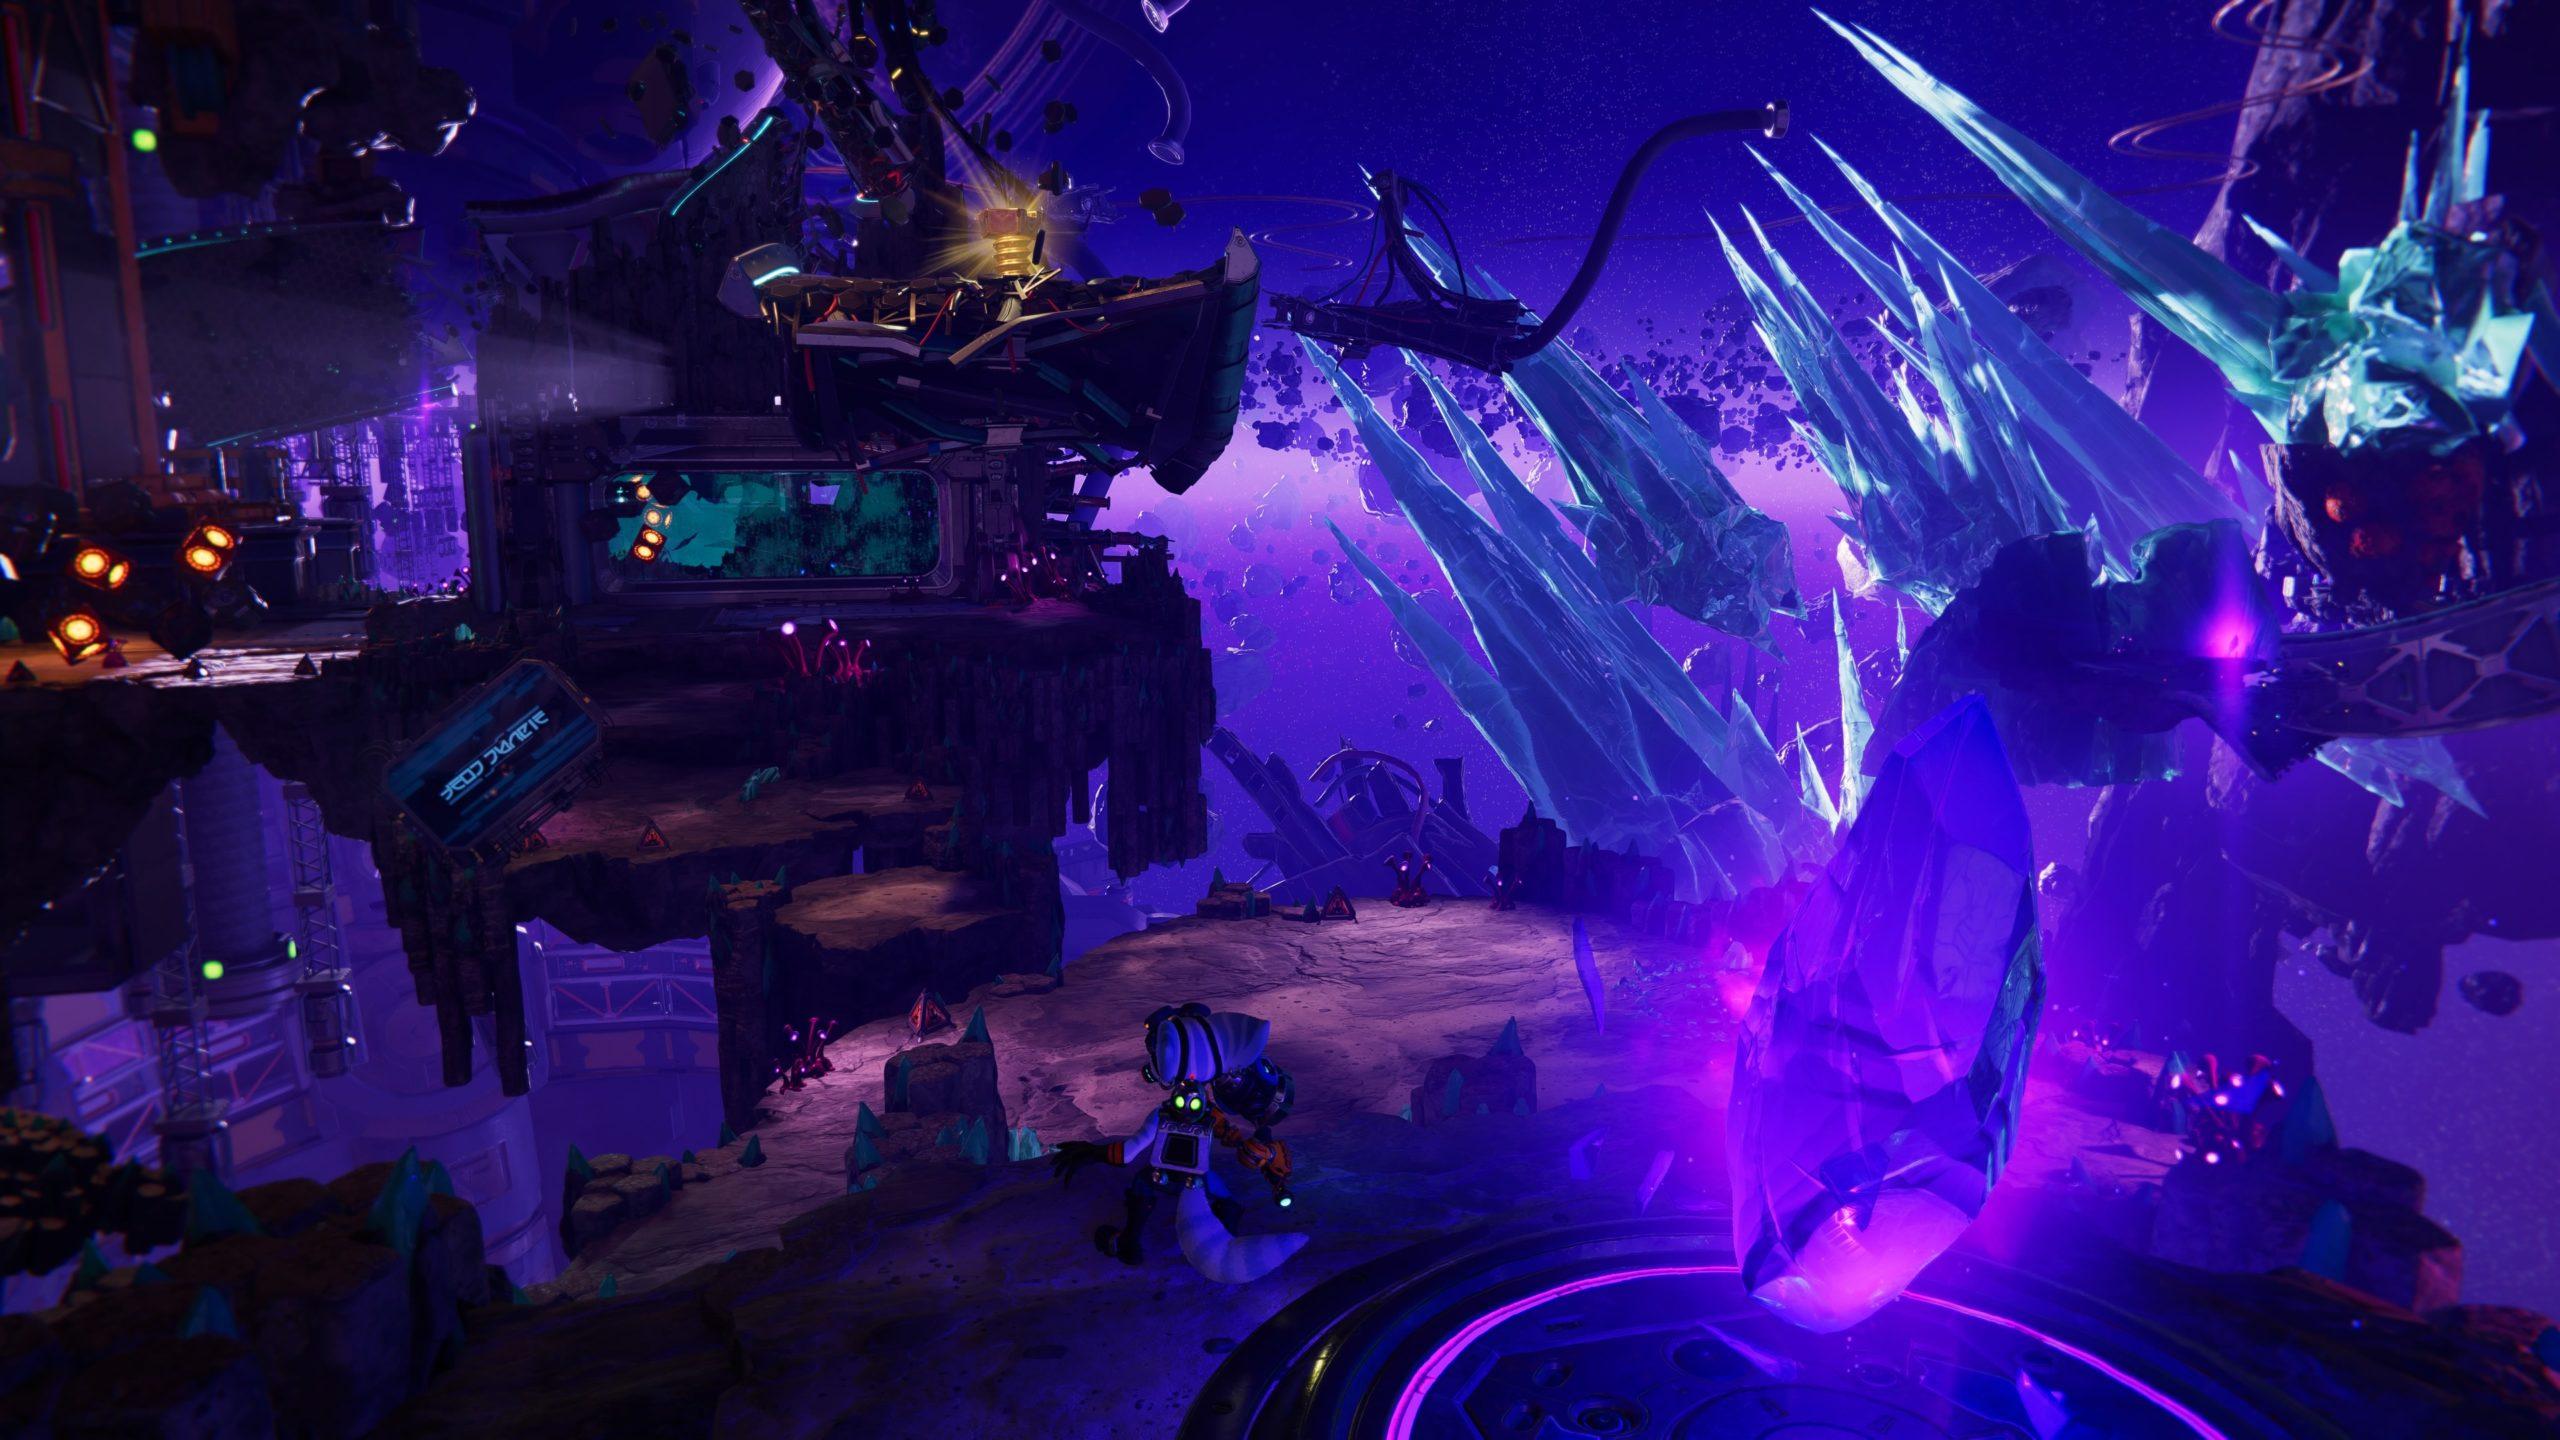 Ratchet Clank Rift Apart Dimensions